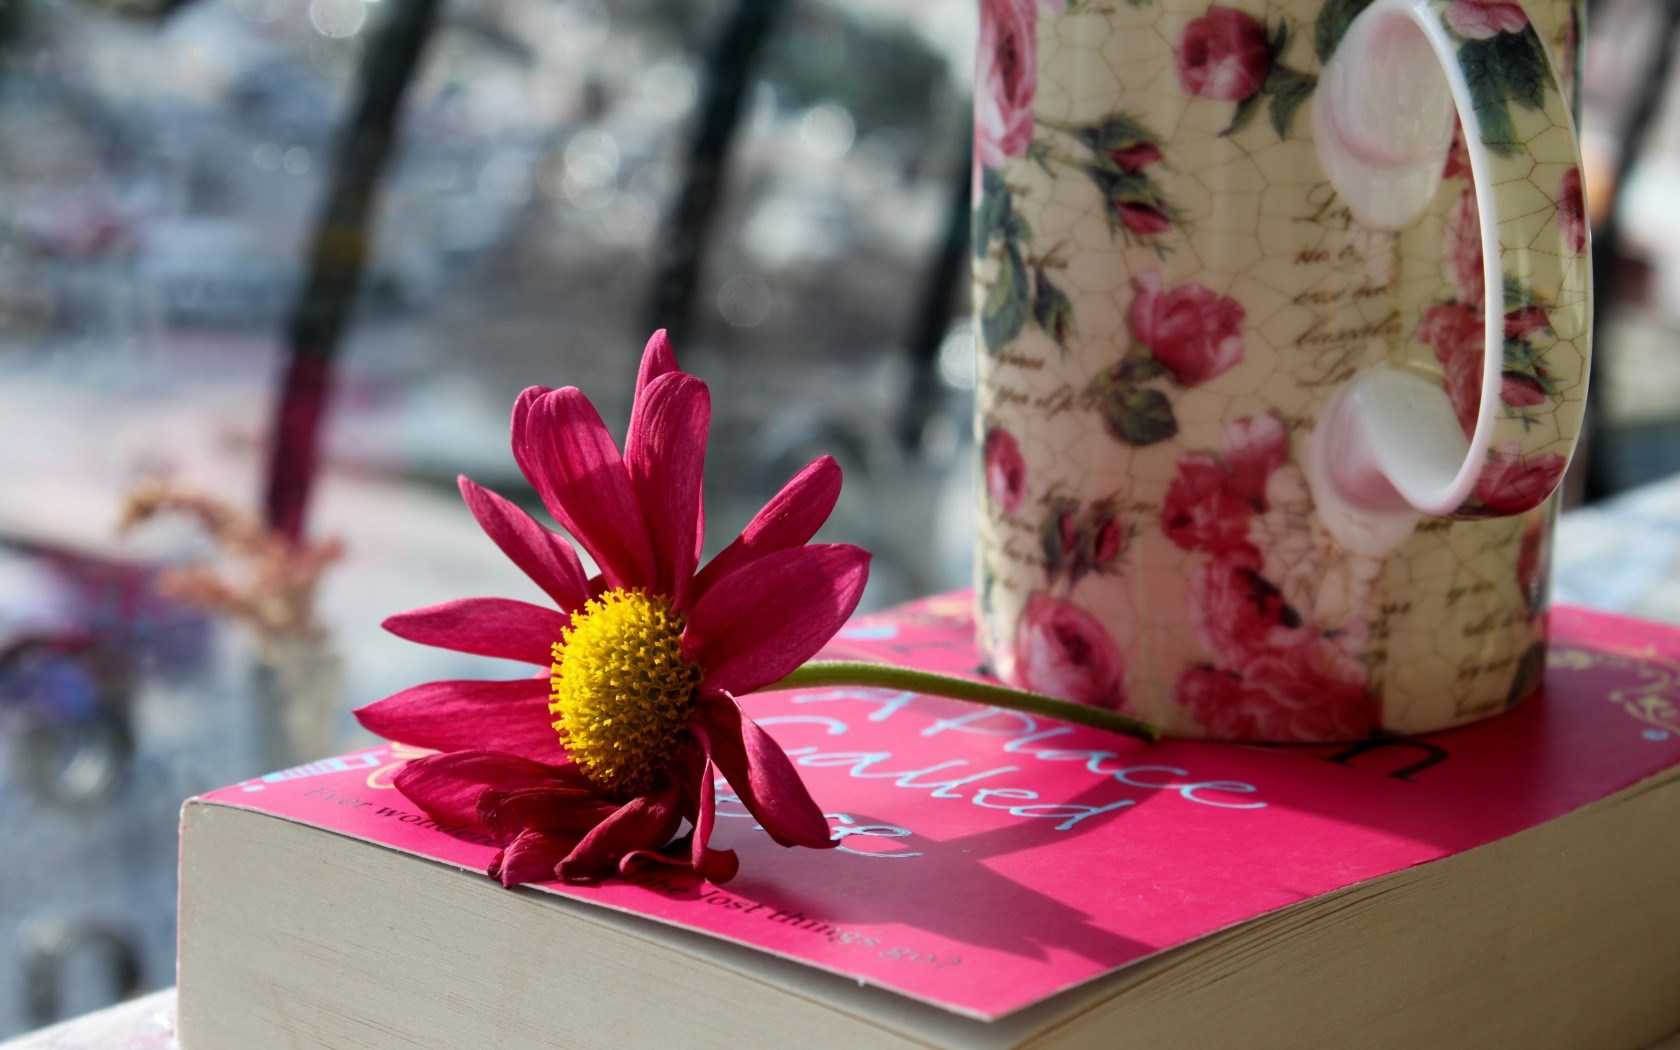 Flower Petals Pink Book Mug Cup